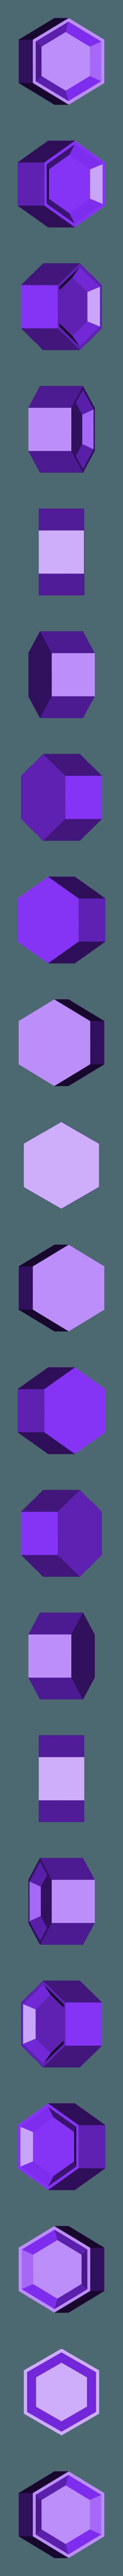 Throne.stl Download free STL file Catapult Defense • 3D print model, FerryTeacher